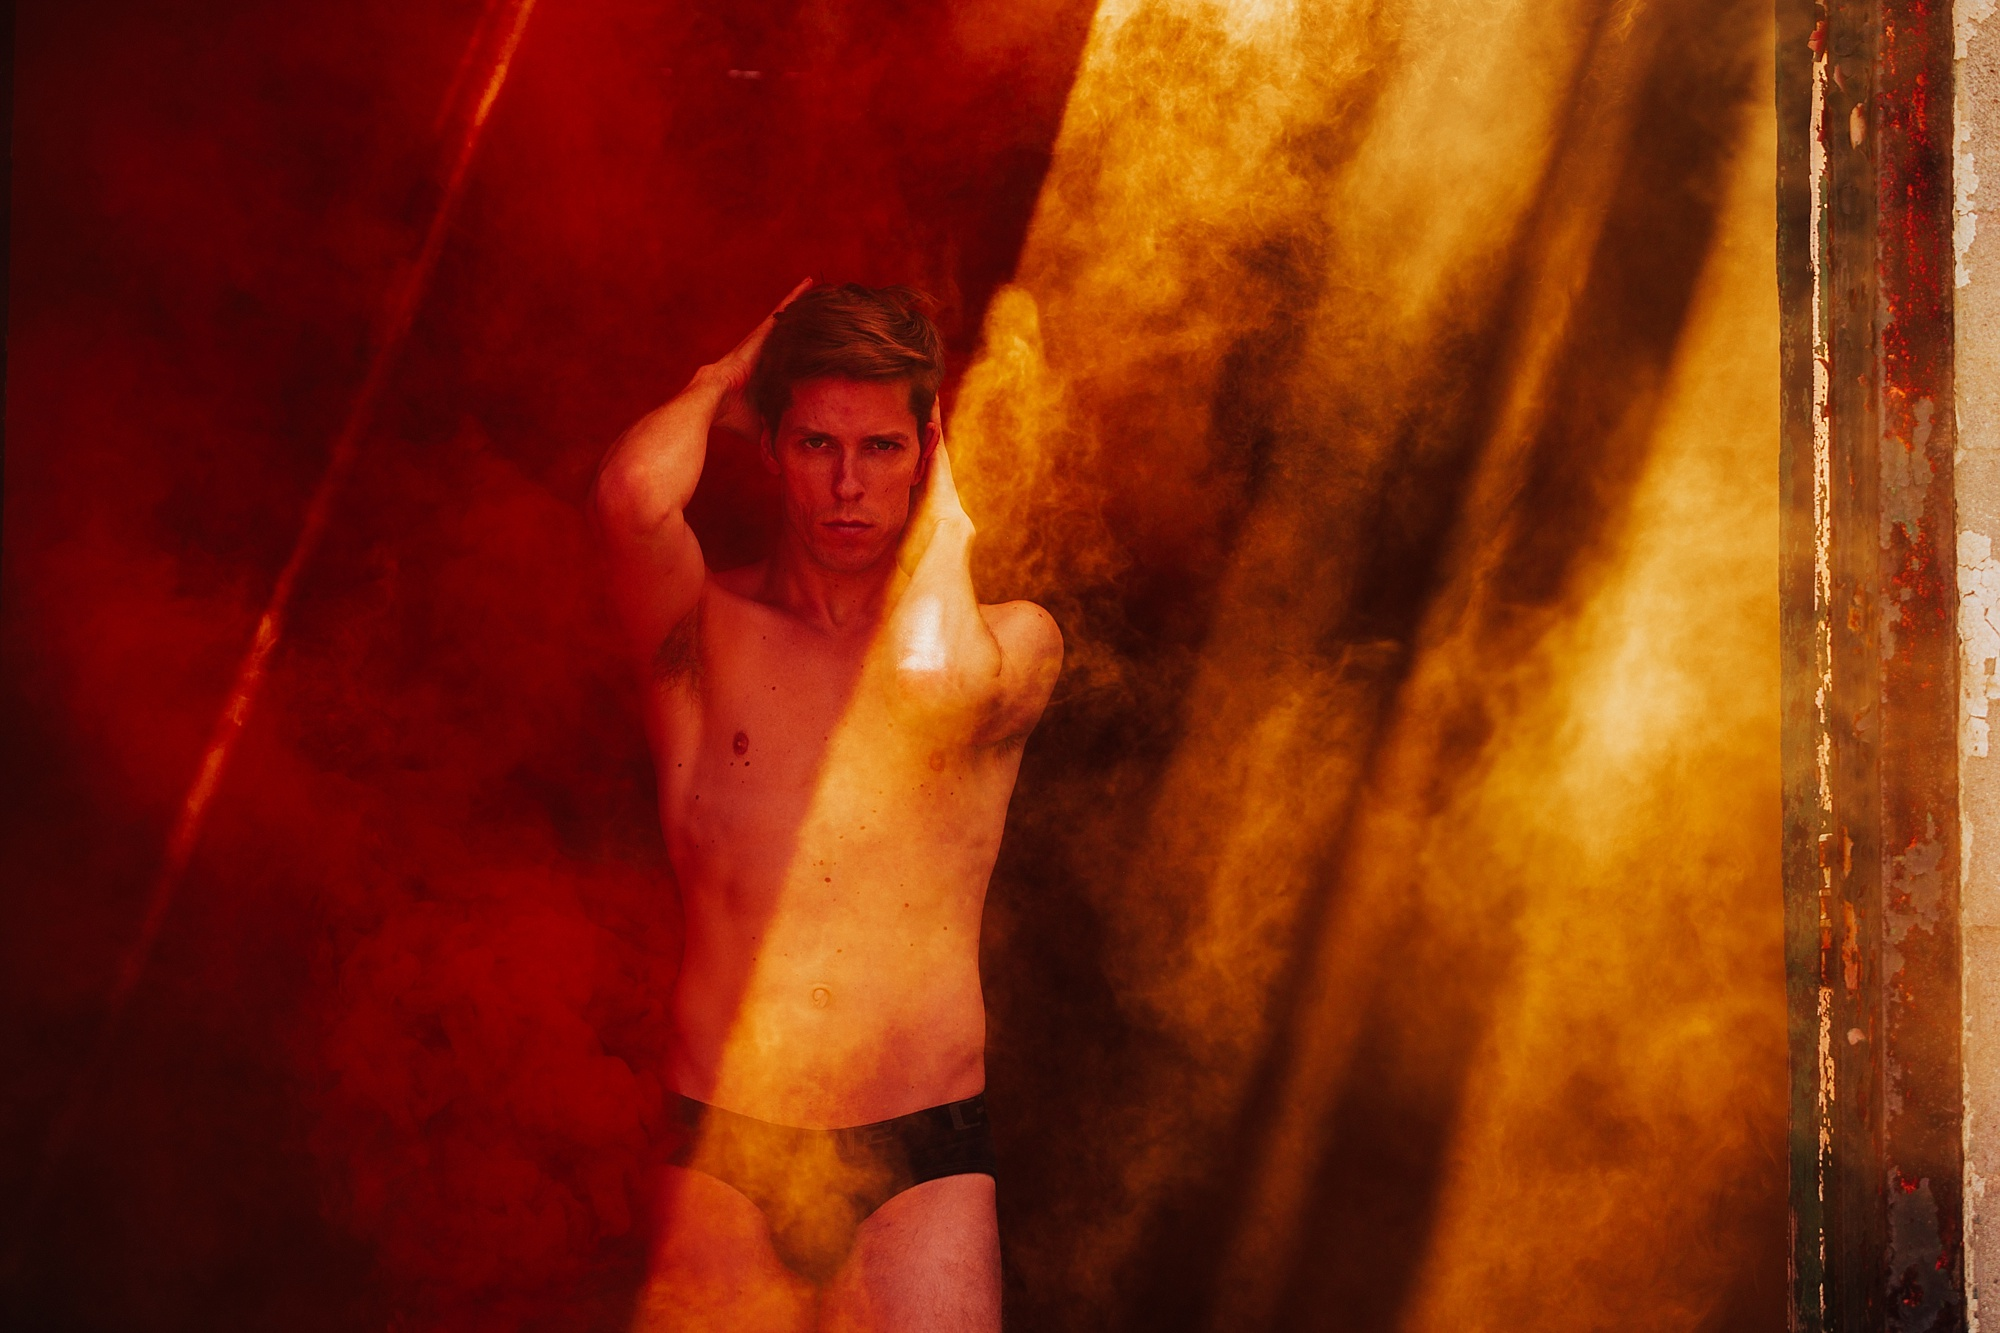 Joe_Mac_Creative_Nude_Portrait_Male_Philadelphia_Chad_Sapp__0038.jpg